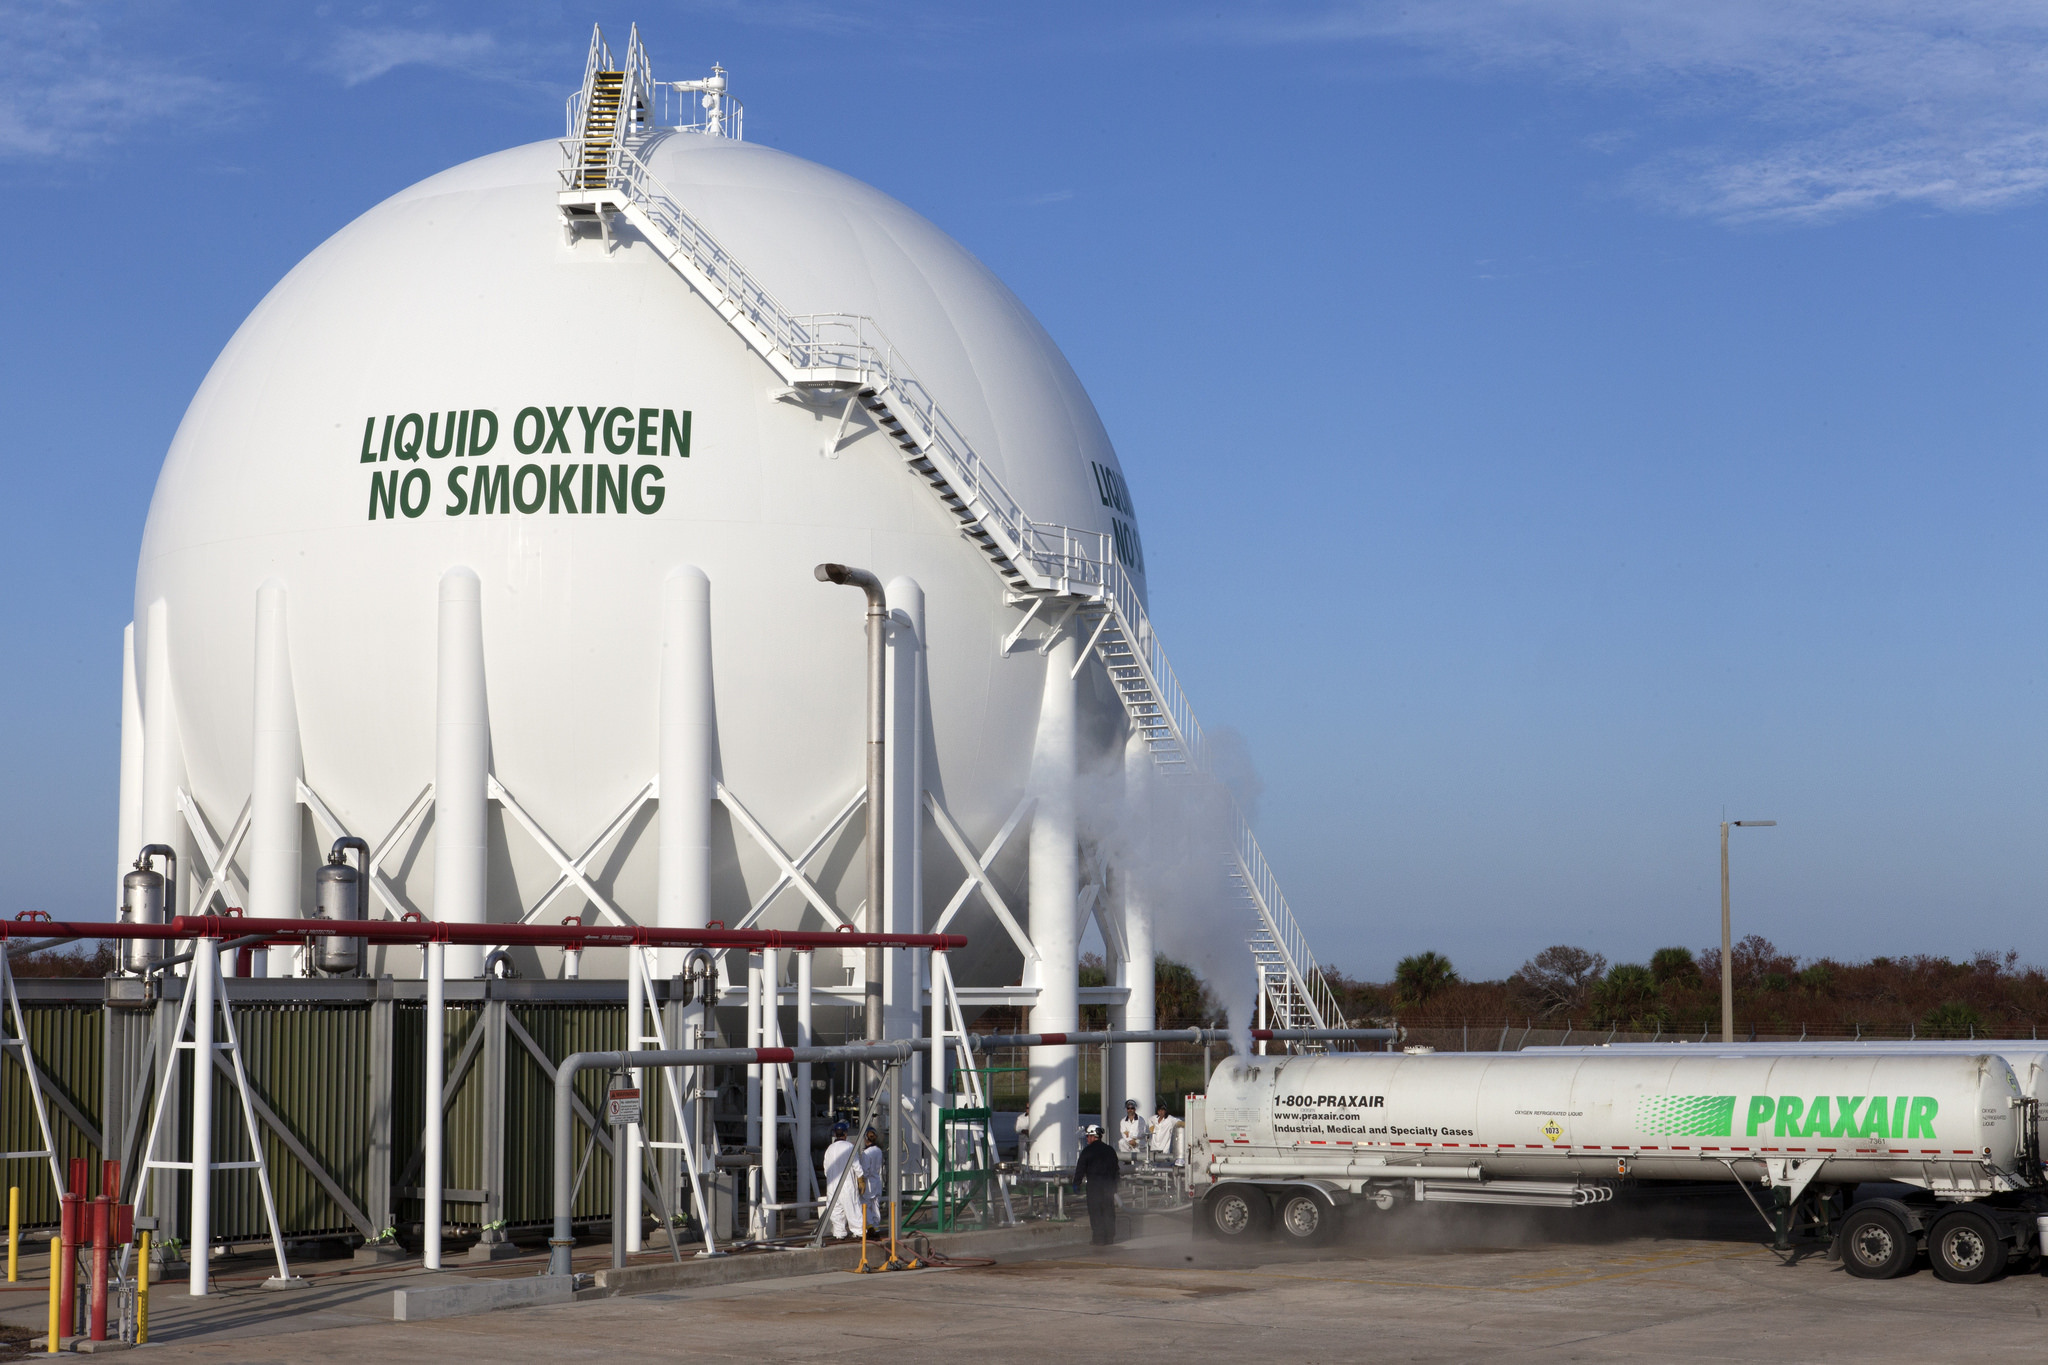 nasa spaceship oxygen tank - photo #33